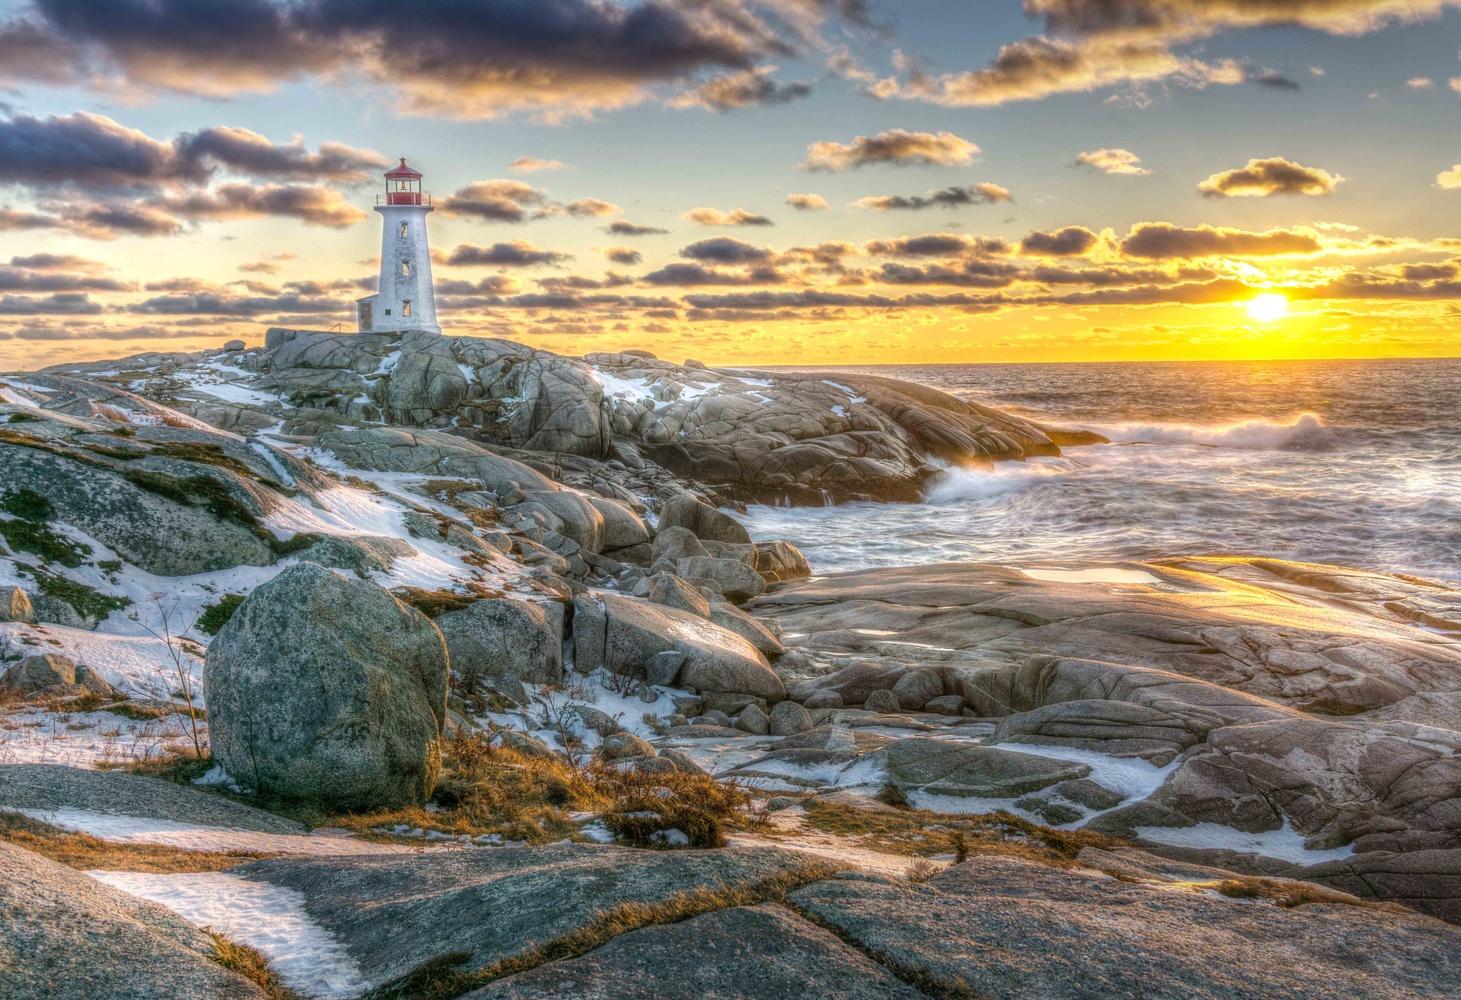 Peggy's Cove, Nova Scotia, Canada by Jean-Marc Desjarlais